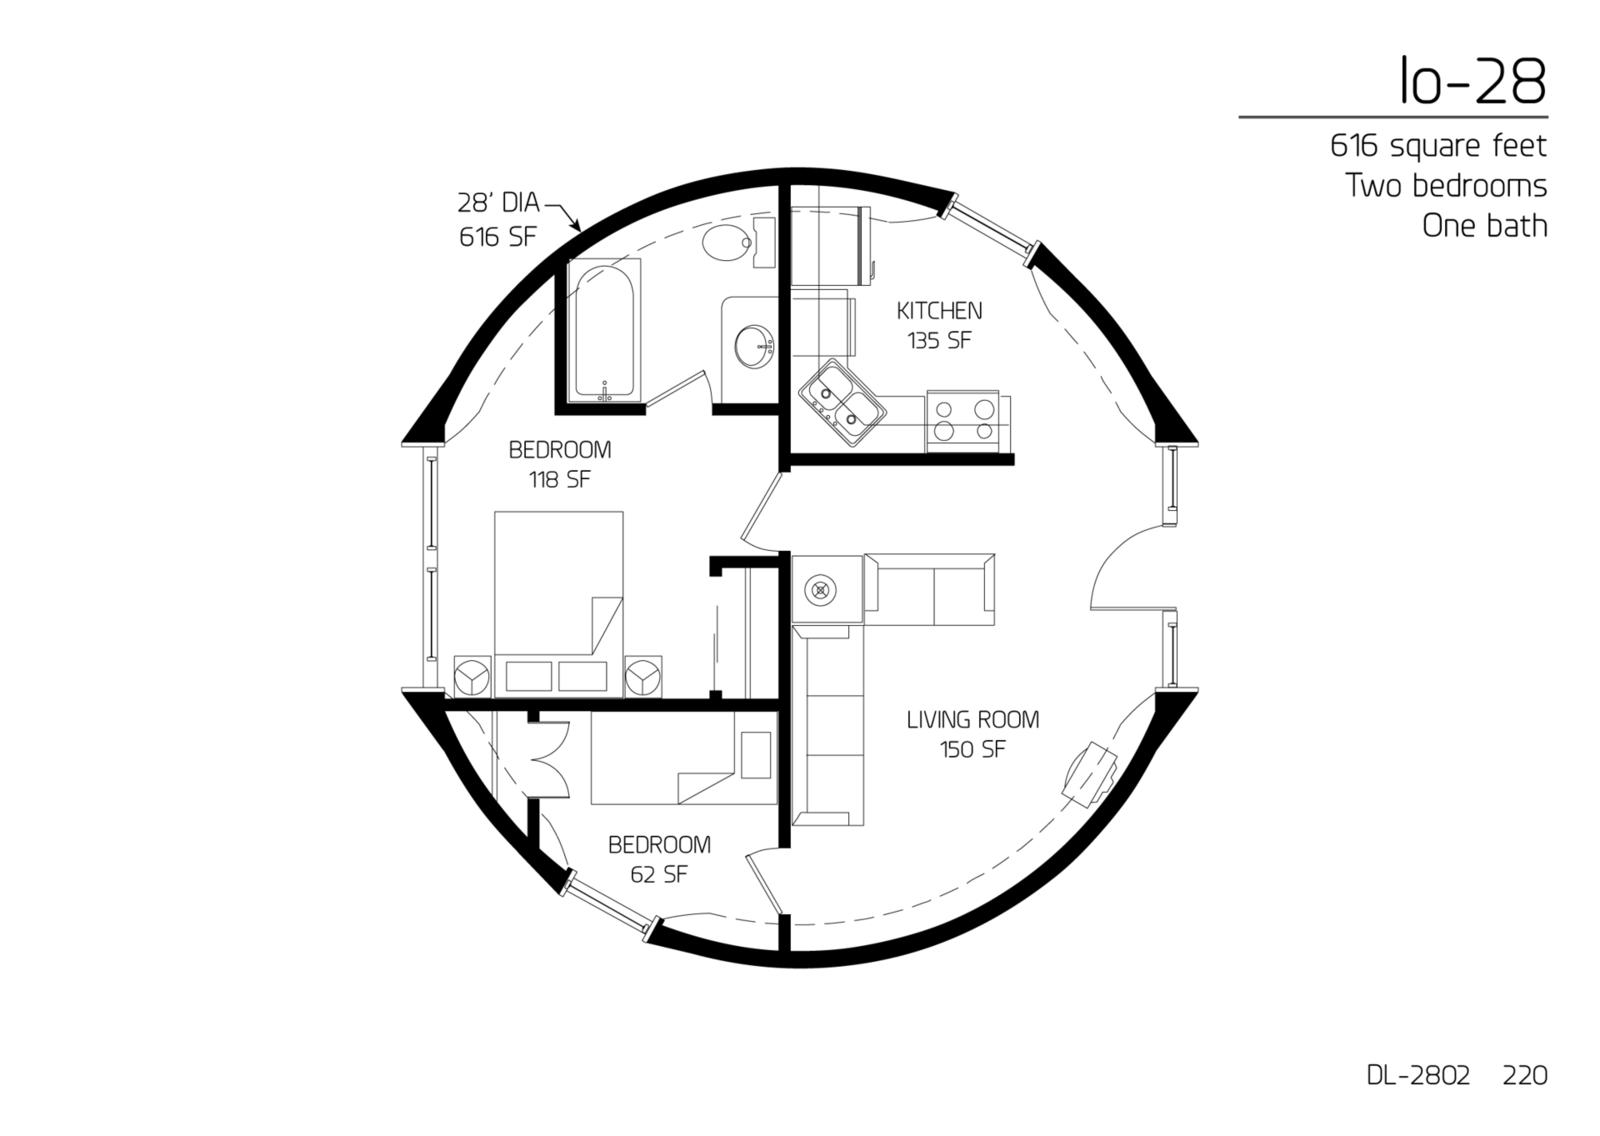 floor plan dl 2802 monolithic dome institute. Black Bedroom Furniture Sets. Home Design Ideas